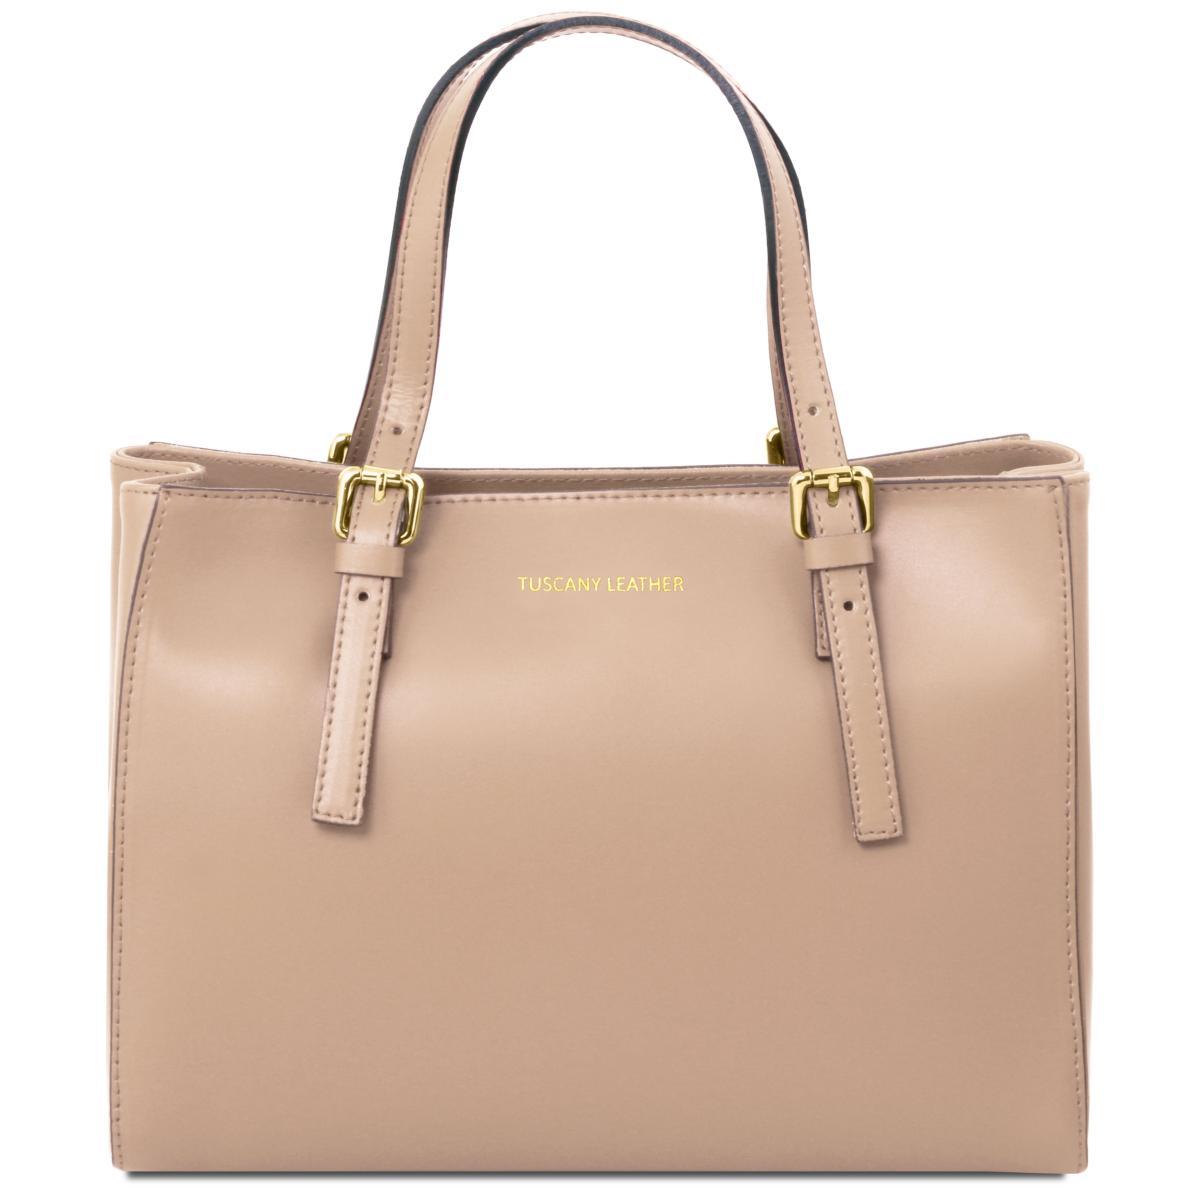 Sac Cuir Cabas Femme Beige - Tuscany Leather -